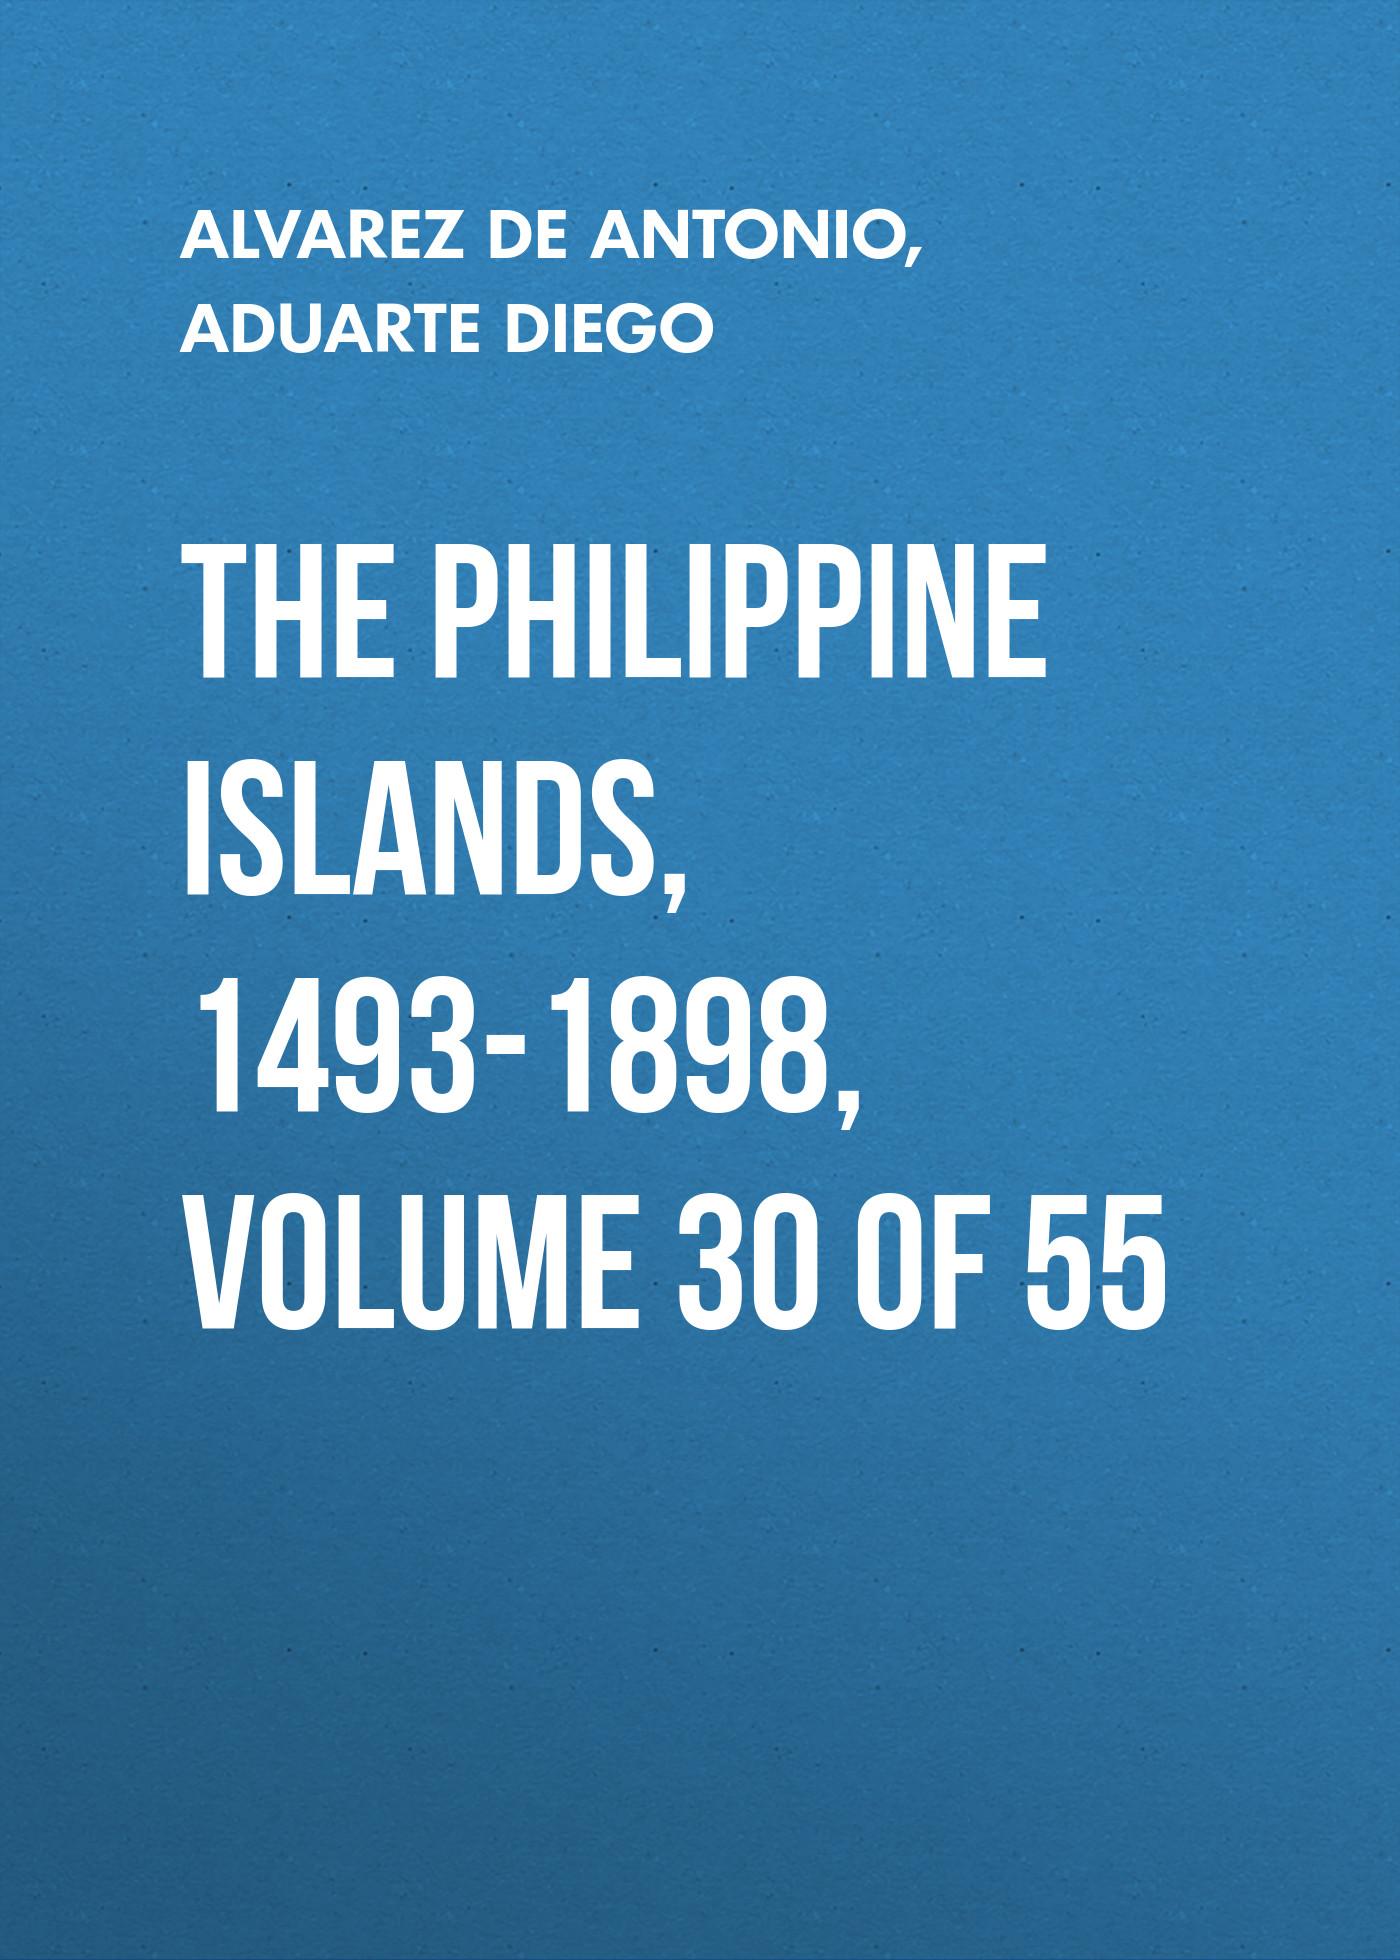 The Philippine Islands, 1493-1898, Volume 30 of 55